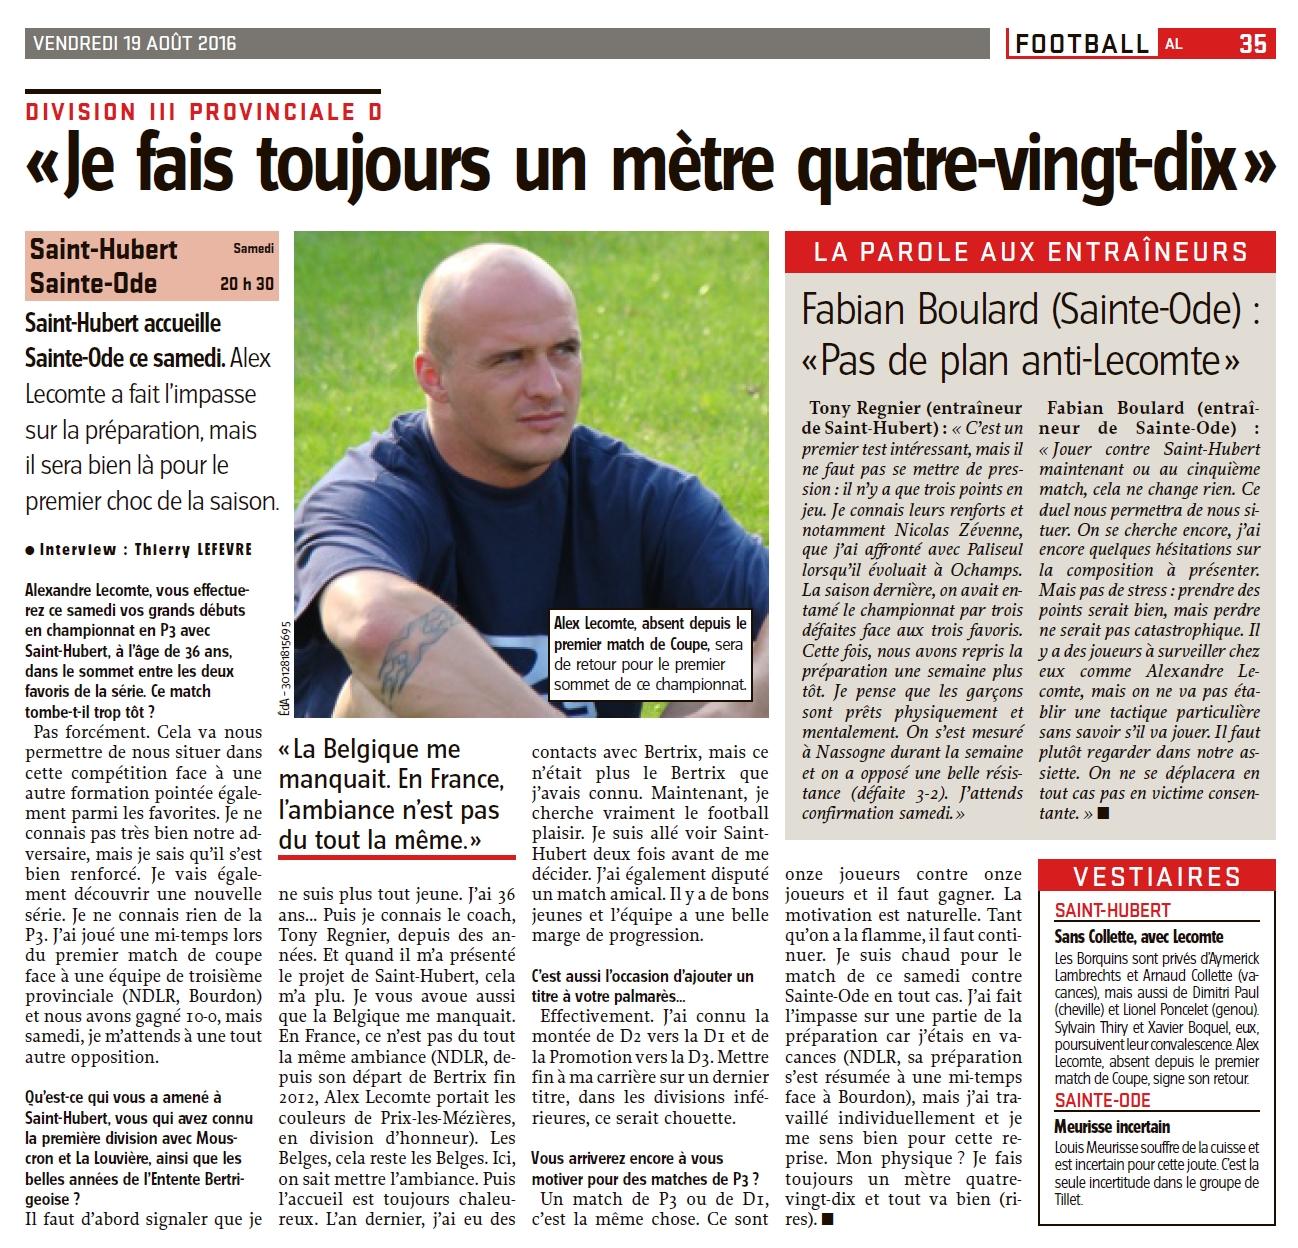 ITW Alex Lecomte